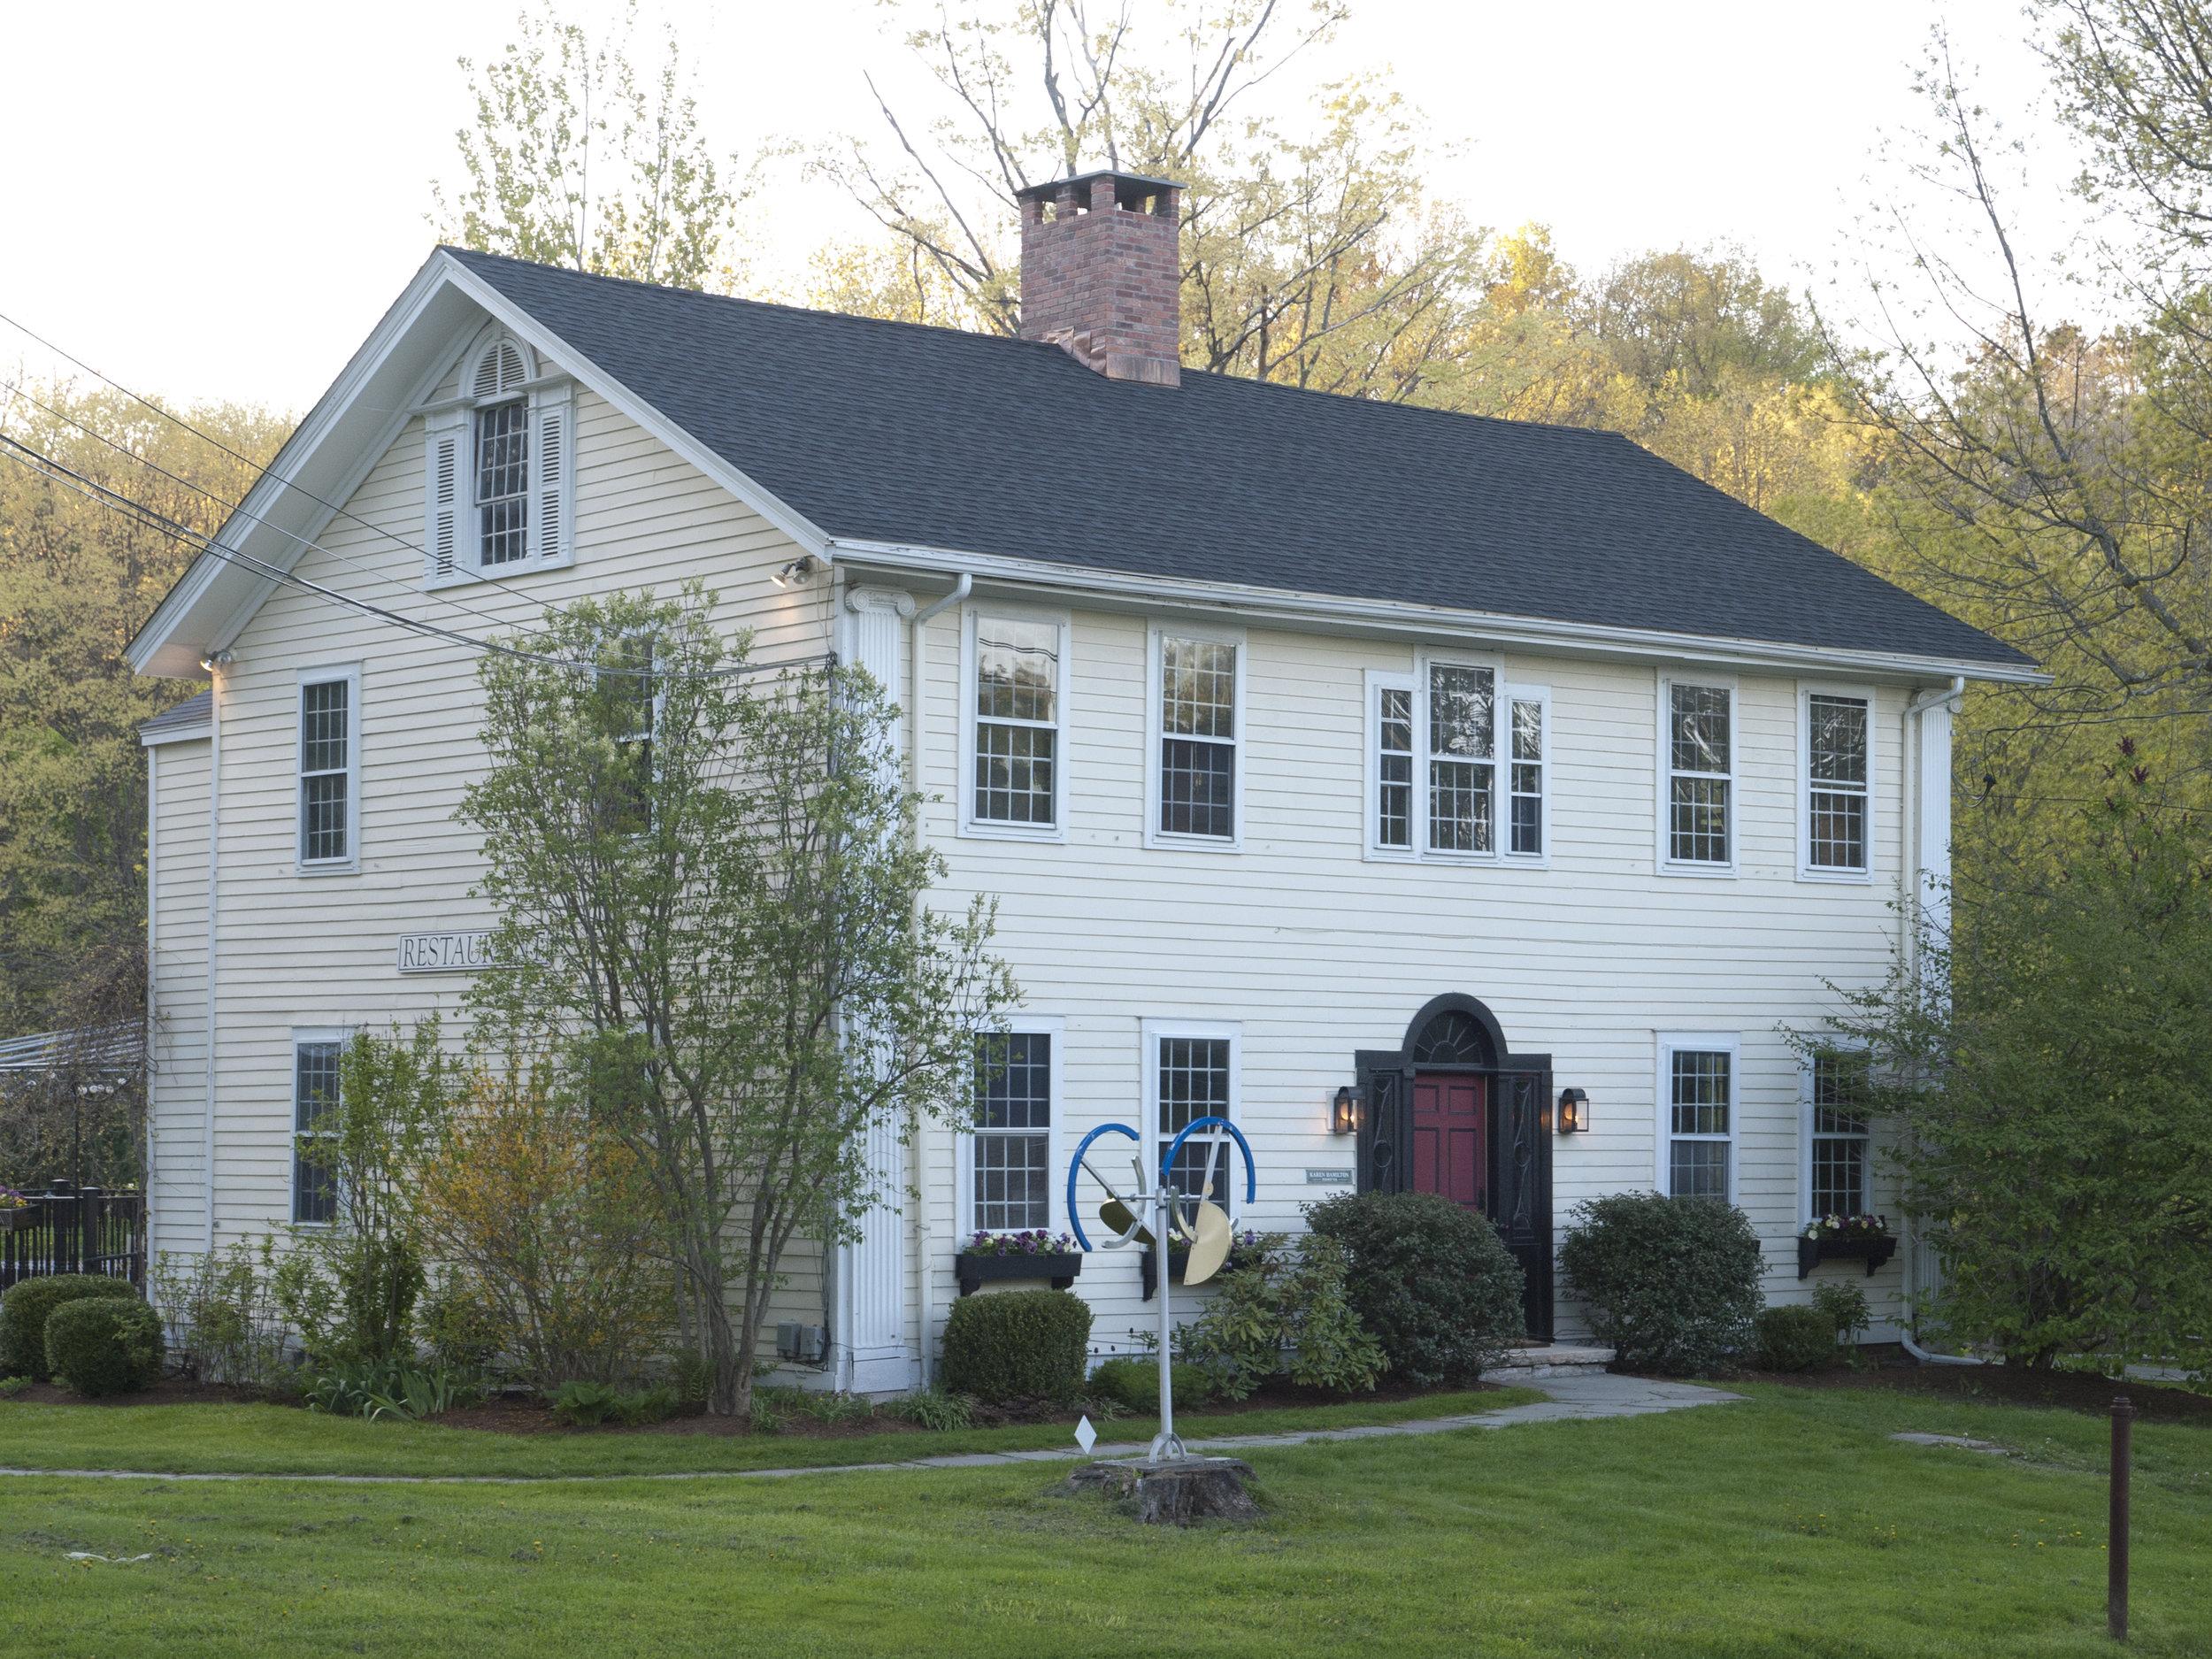 Lord-Haas House 2, 223 Main Street.jpg